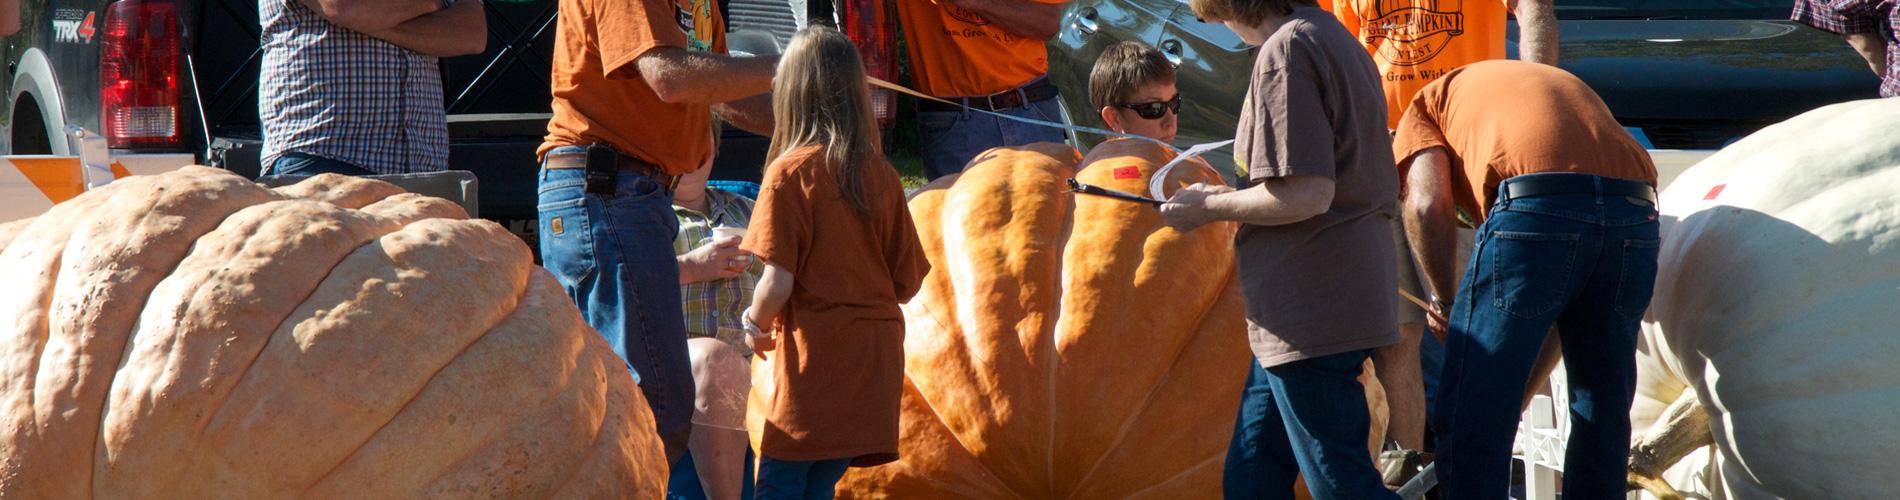 pumpkinfest contest